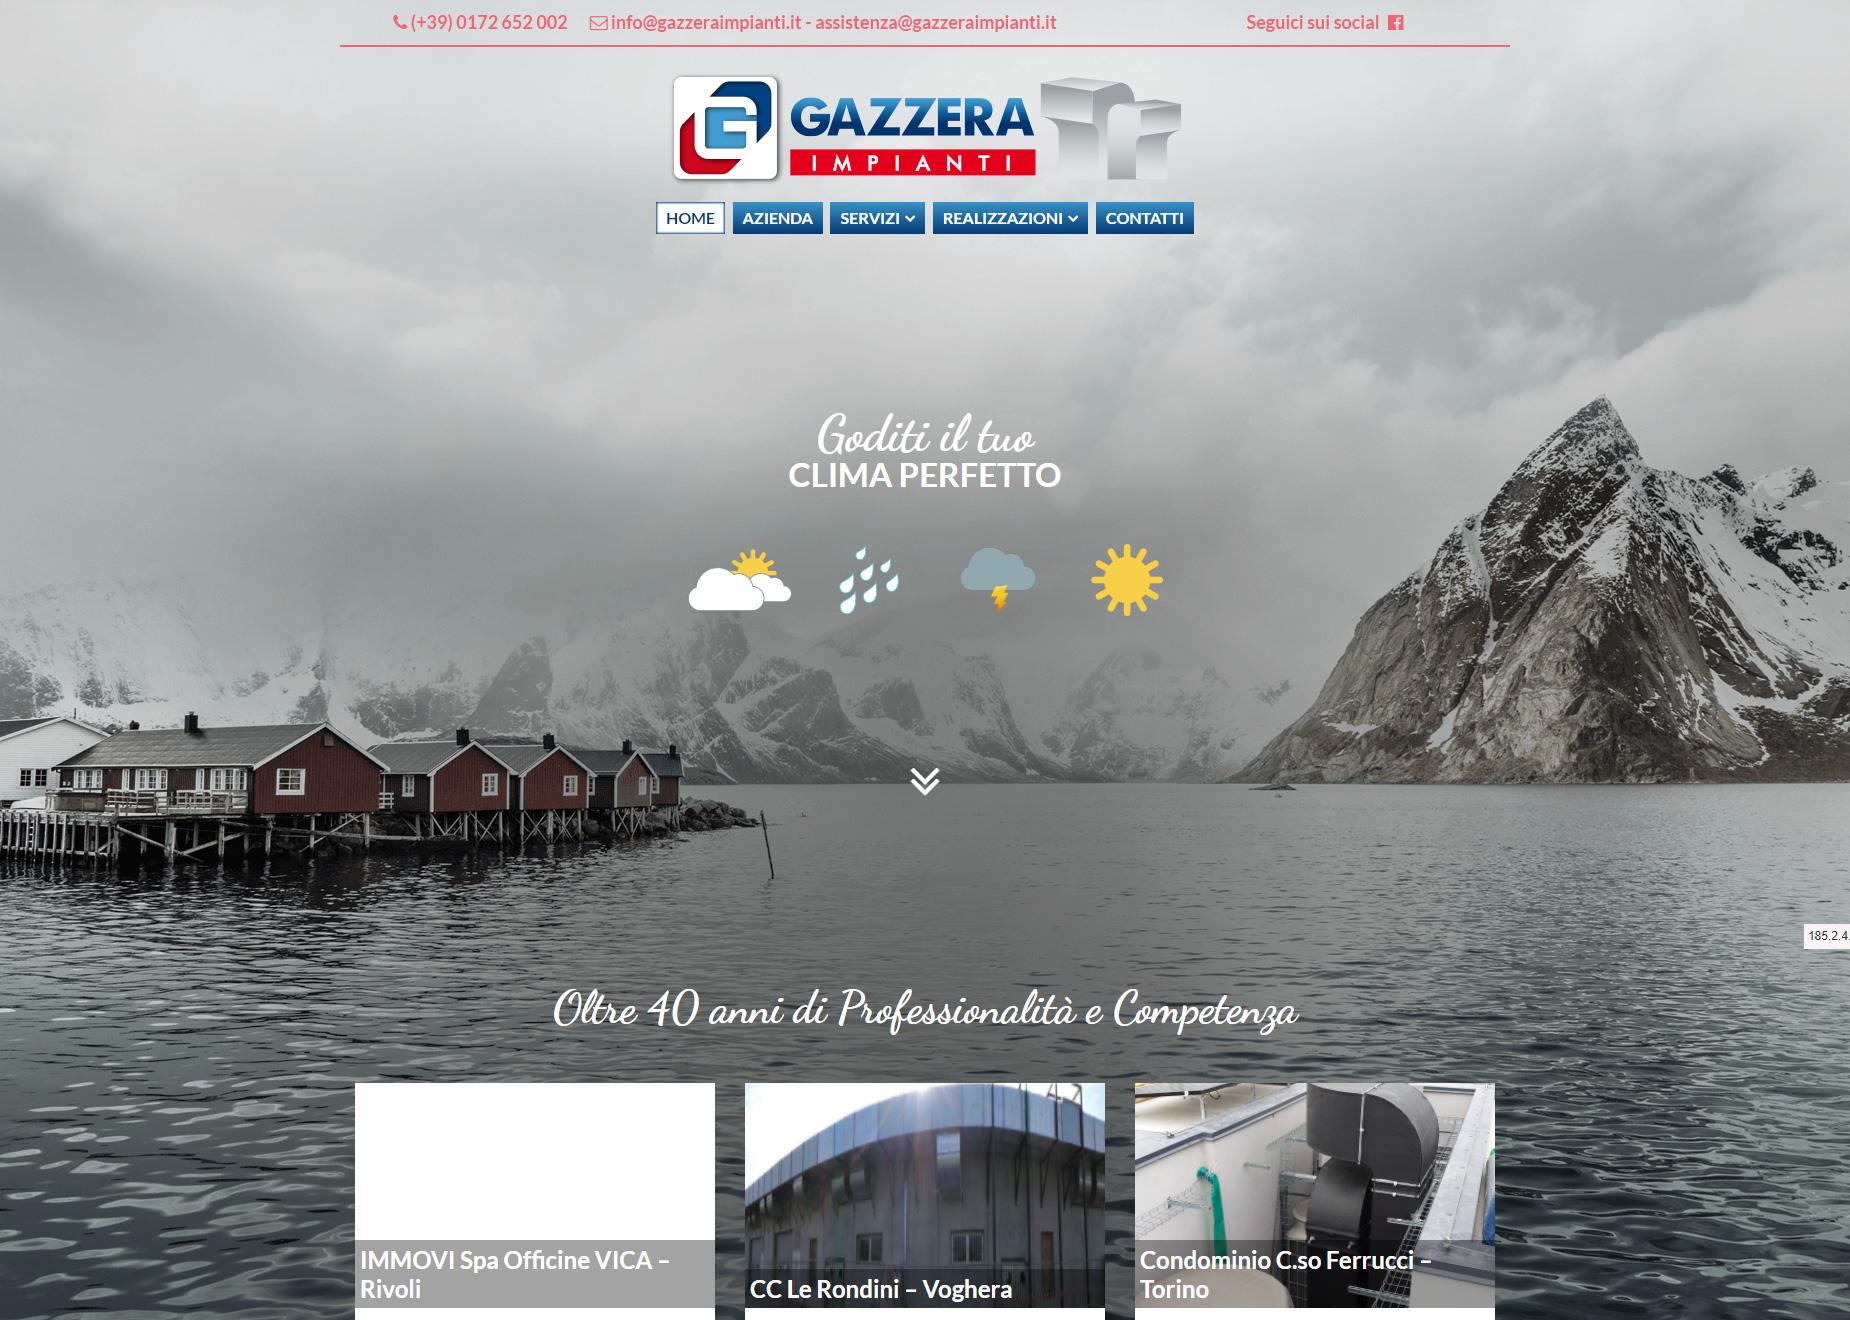 screencapture-gazzeraimpianti-it-1512991191153